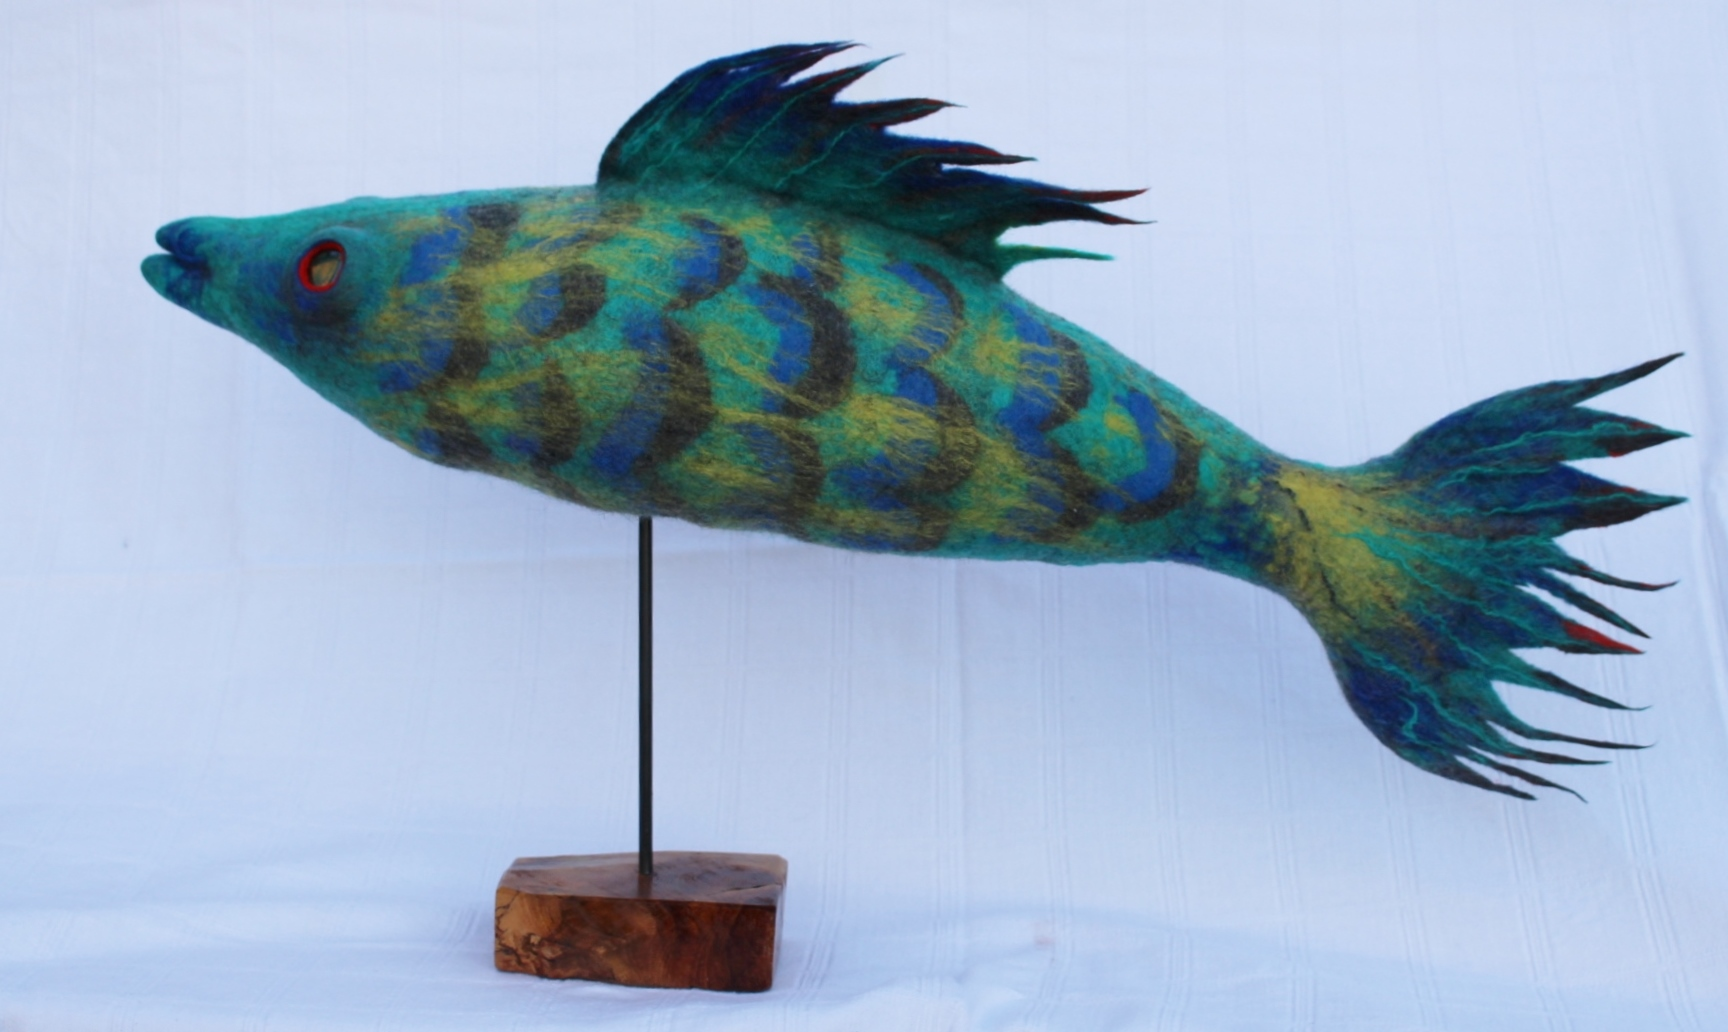 Parrotfish, Elaine Peden, element15